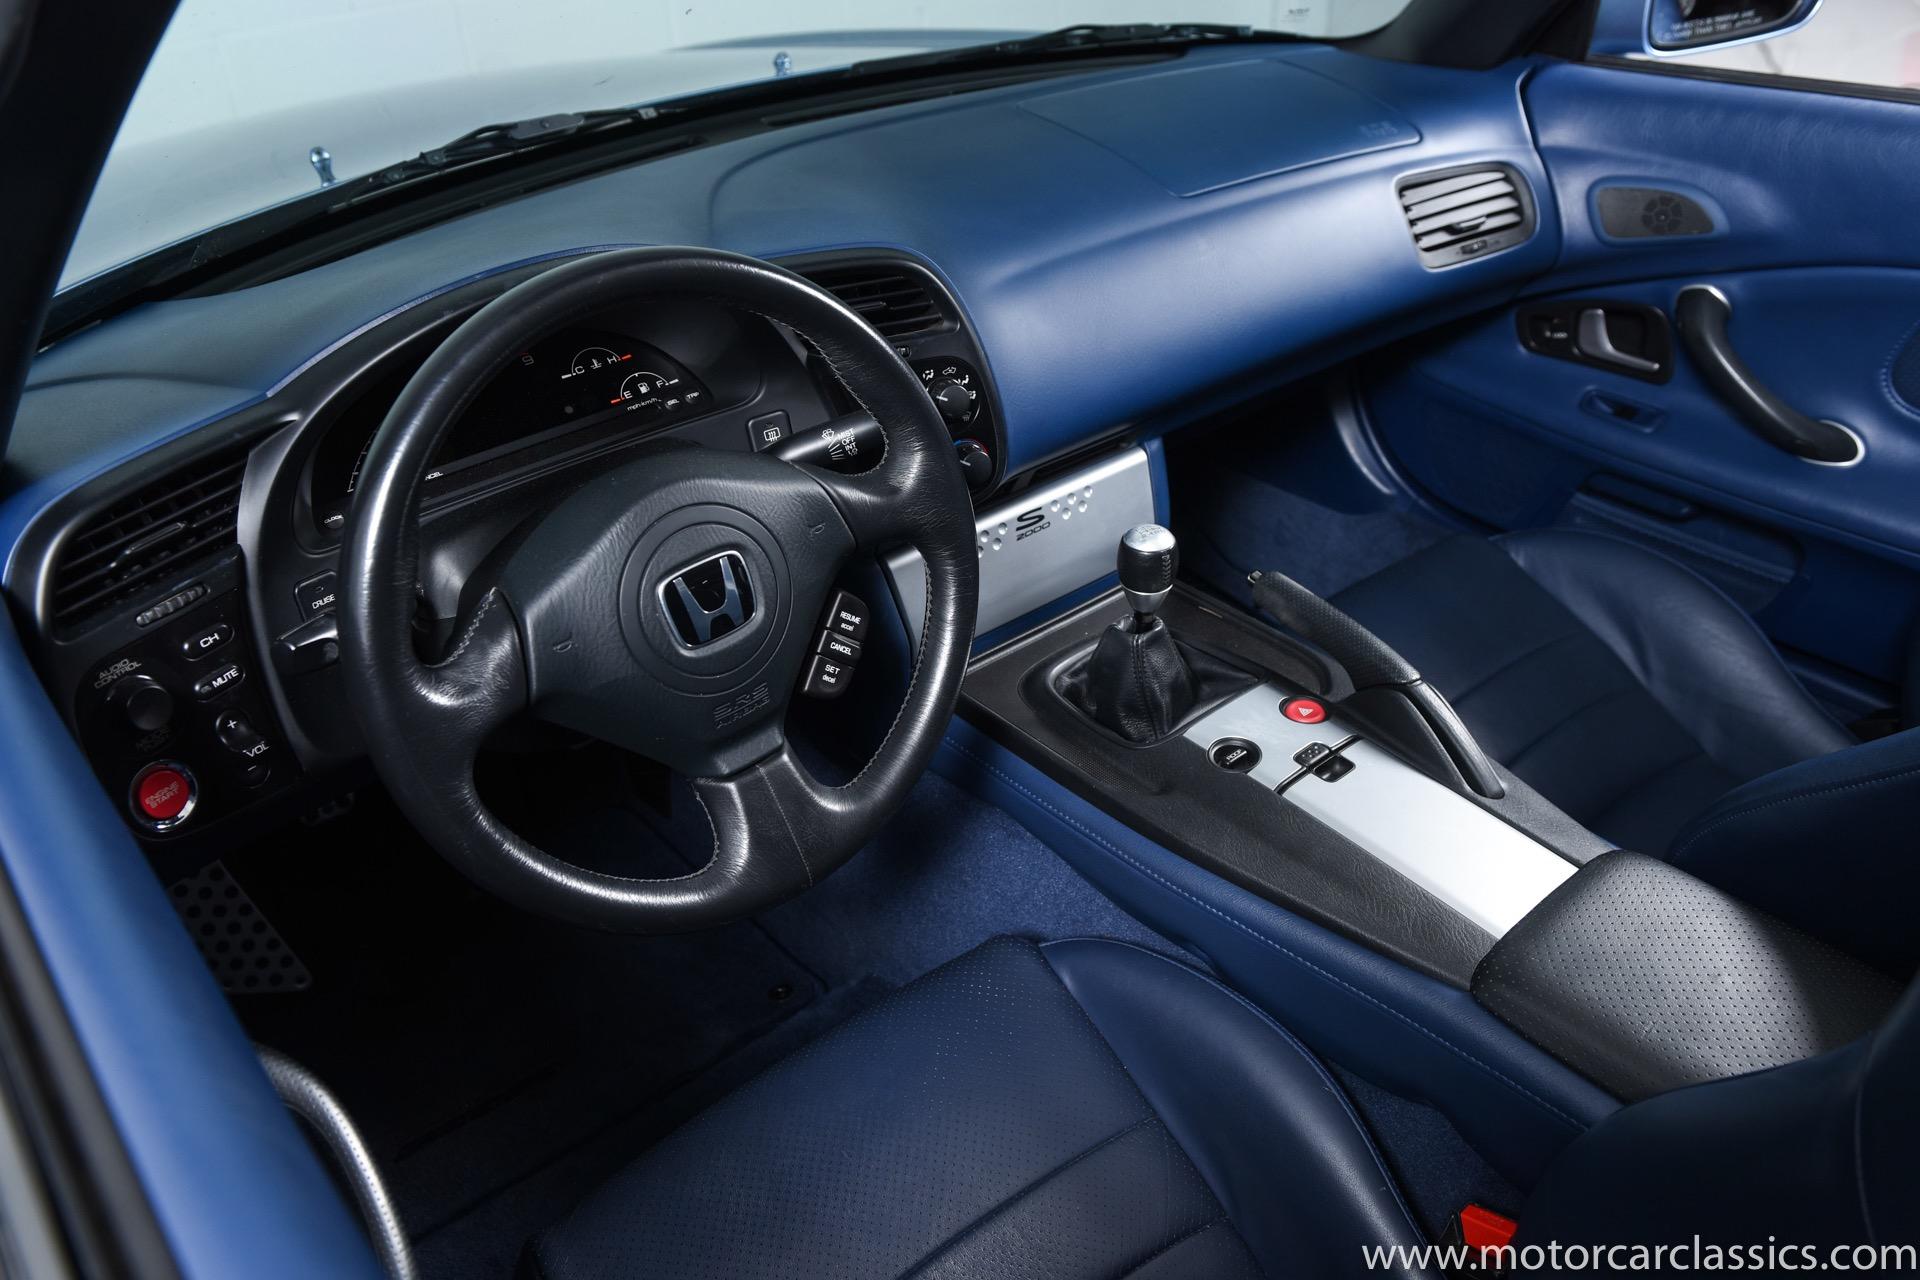 Used 2004 Honda S2000 For Sale ($32,500) | Motorcar ...